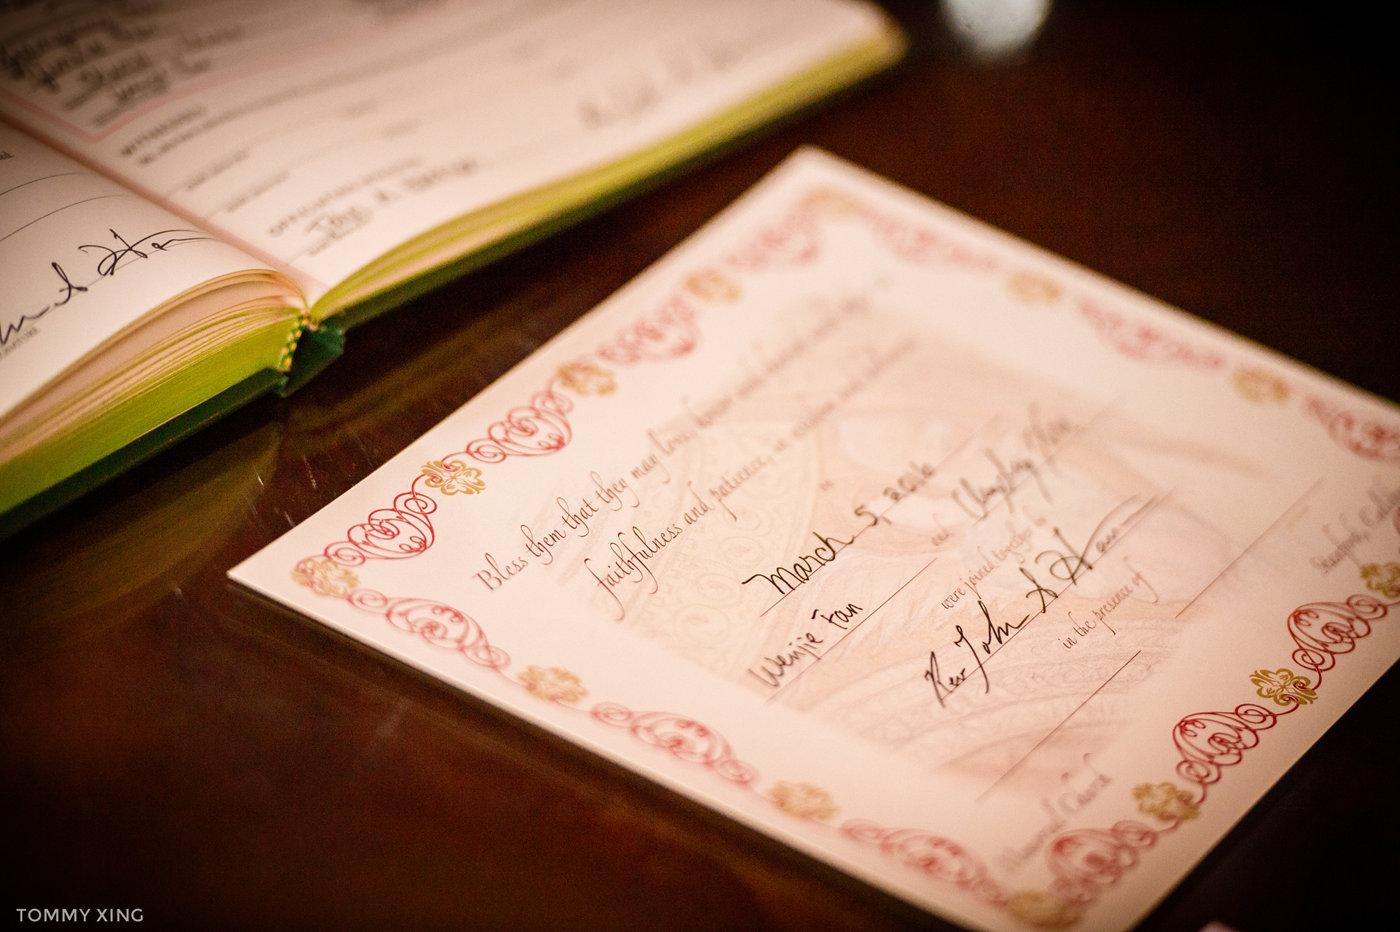 STANFORD MEMORIAL CHURCH WEDDING - Wenjie & Chengcheng - SAN FRANCISCO BAY AREA 斯坦福教堂婚礼跟拍 - 洛杉矶婚礼婚纱照摄影师 Tommy Xing Photography134.jpg